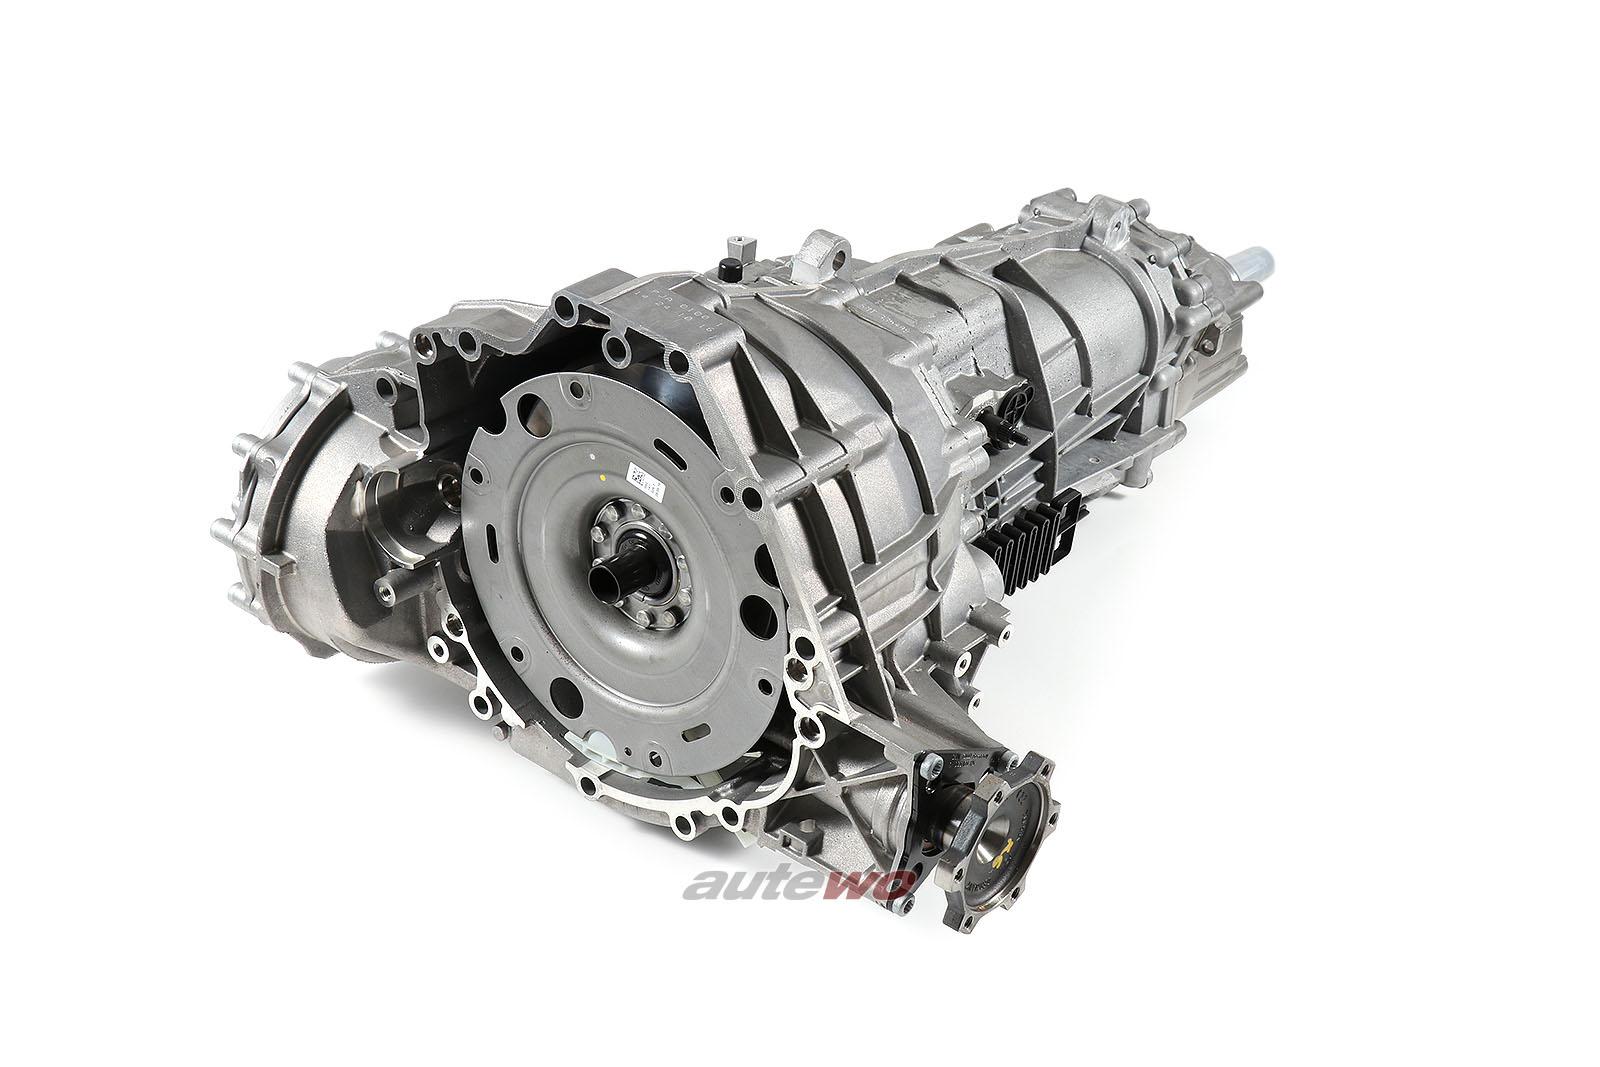 0B2300029Q NEU Audi A4 8K/A5 8T 2.0l TFSI 6-Gang Schaltgetriebe Quattro PJA